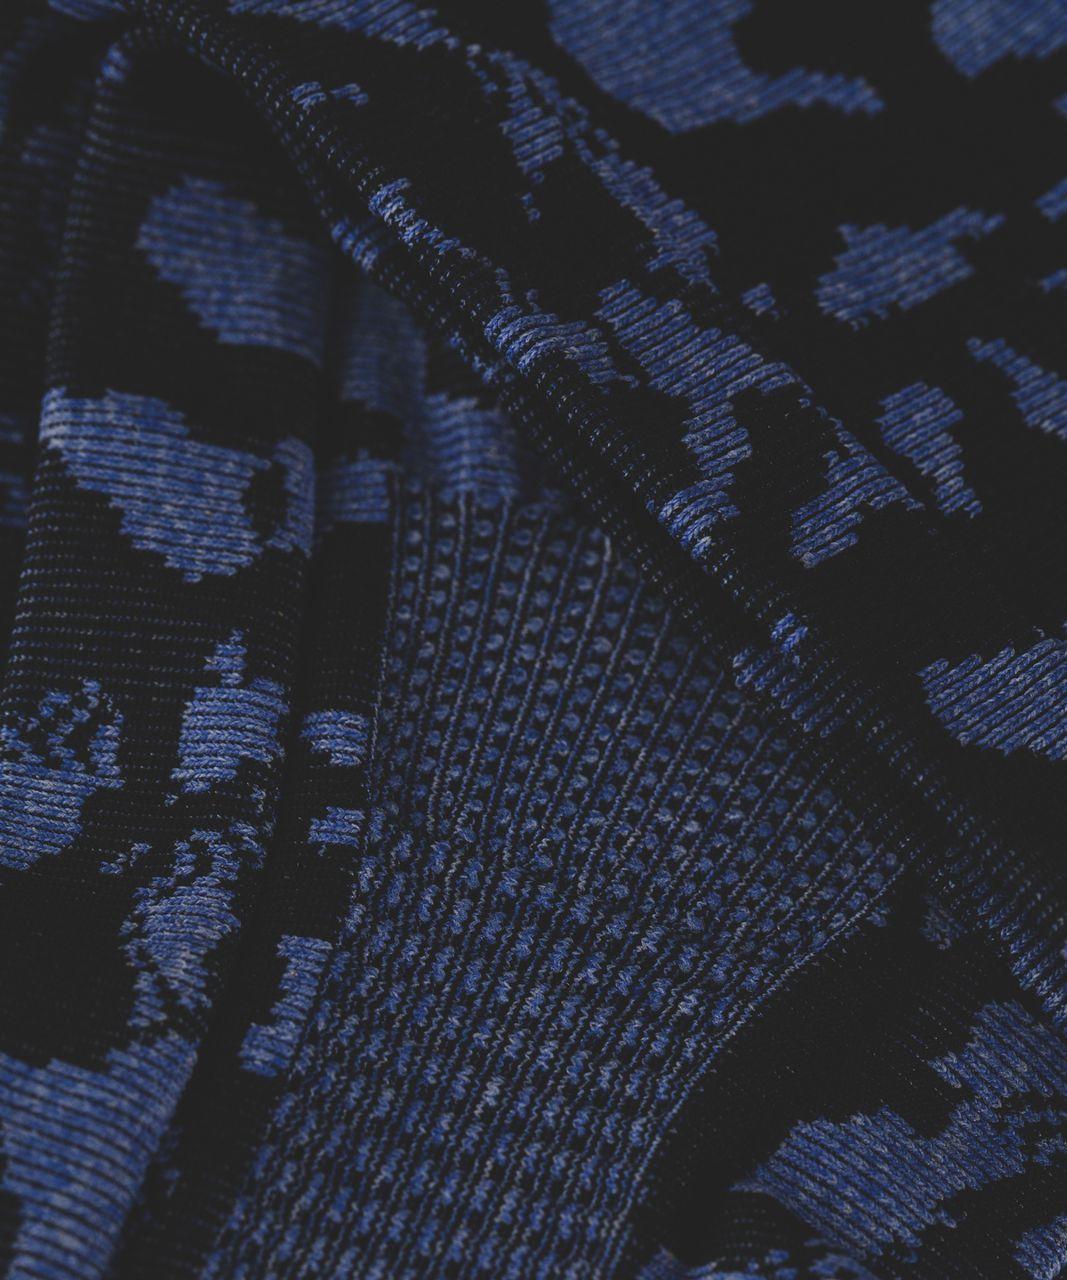 Lululemon Bangs Back Headwrap - Heathered Sapphire Blue / Black